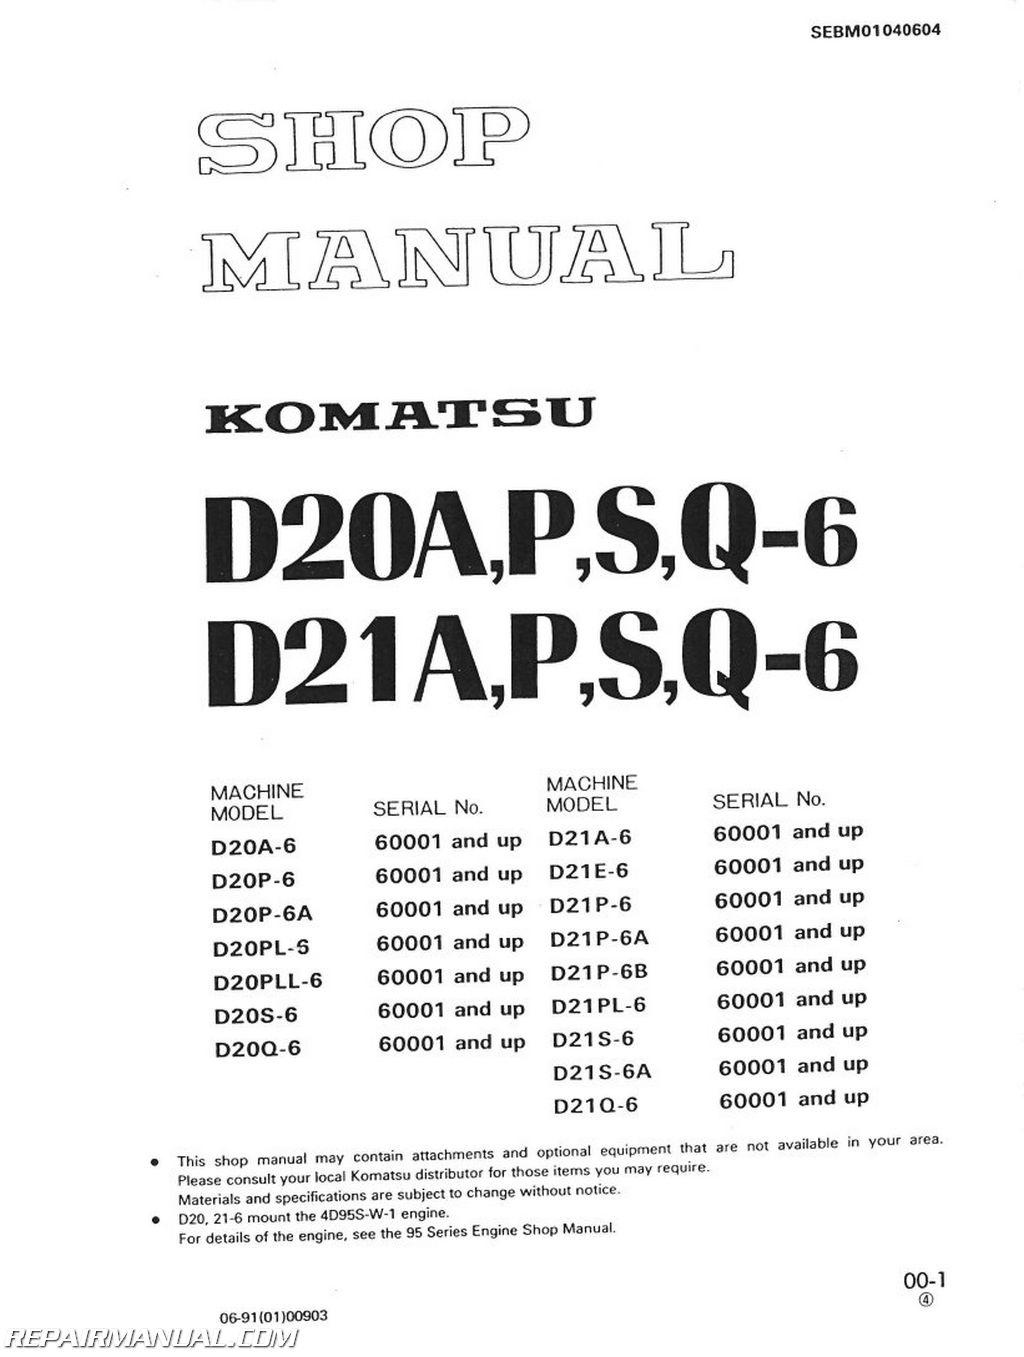 Komatsu Wiring Schematics Forklift Diagrams D20 Diagram D31p Complete U2022 For D37e 5